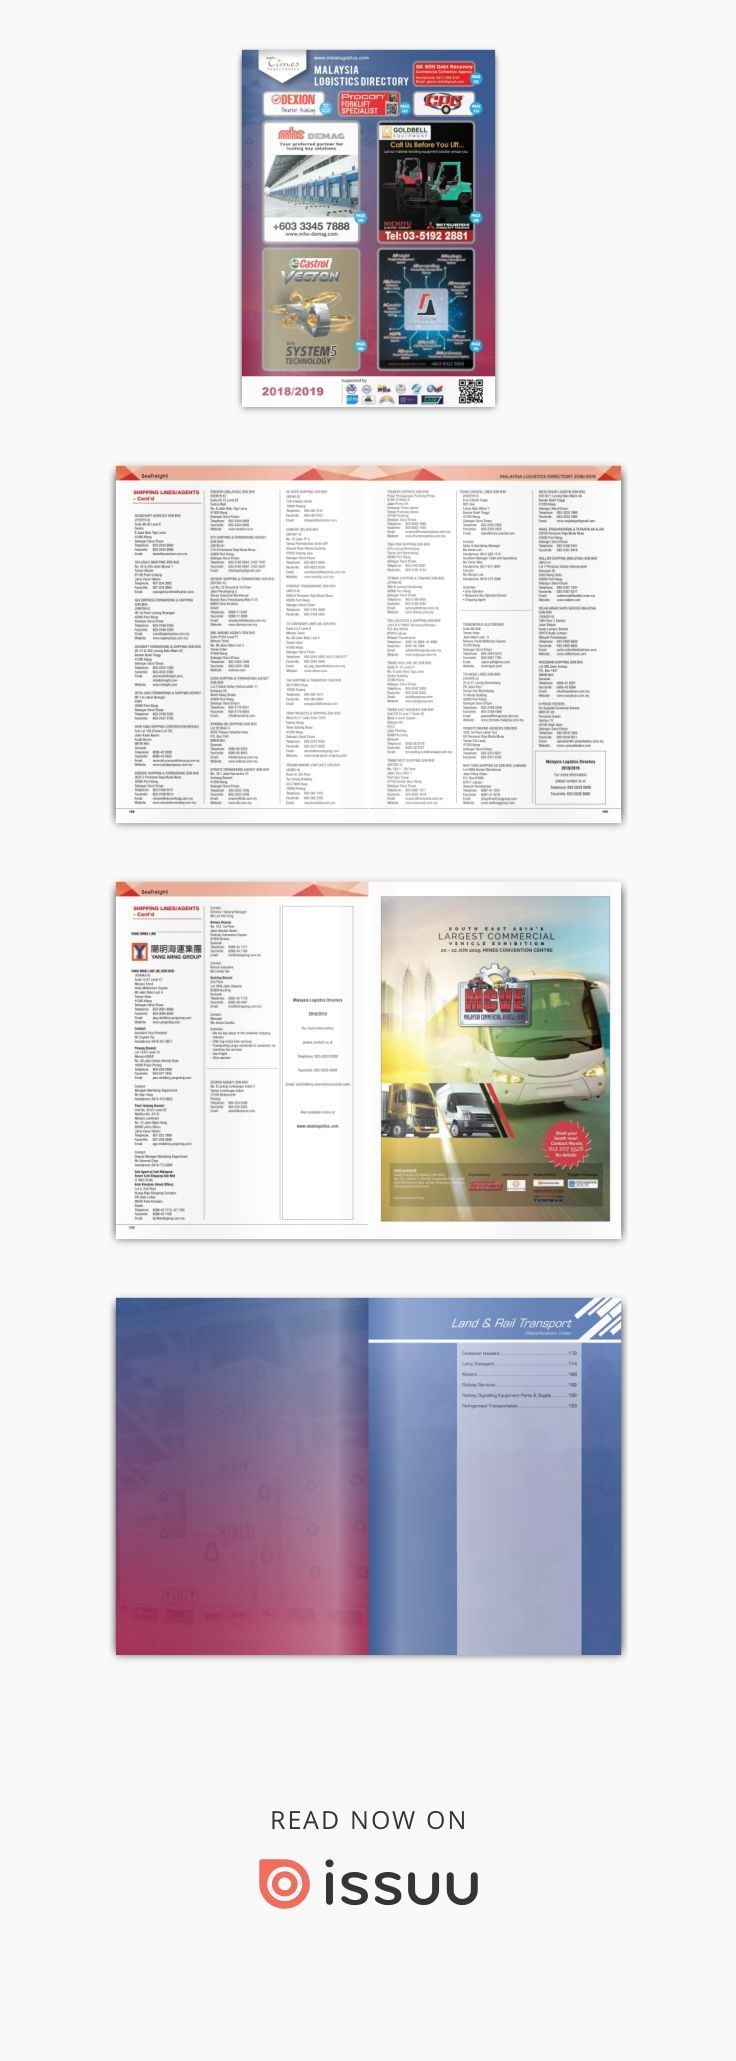 Malaysia Logistics Directory 2018/2019 | Logistic | Transport